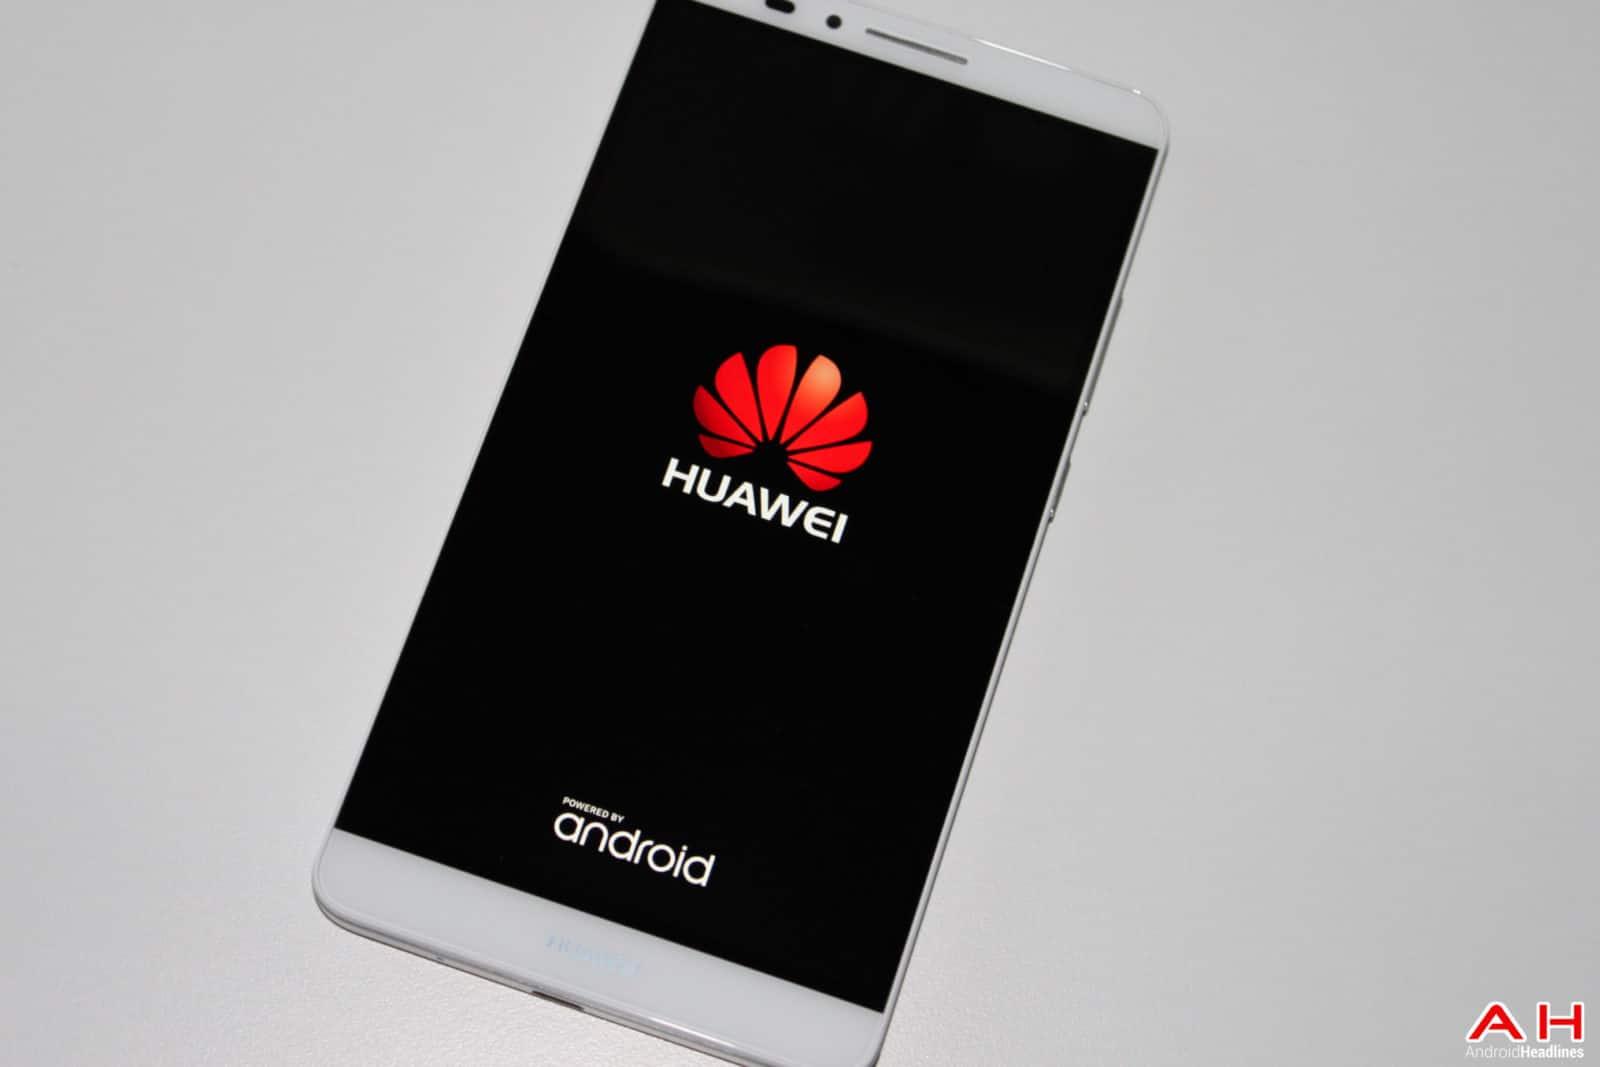 AH Huawei Logo Android Mate 7-6